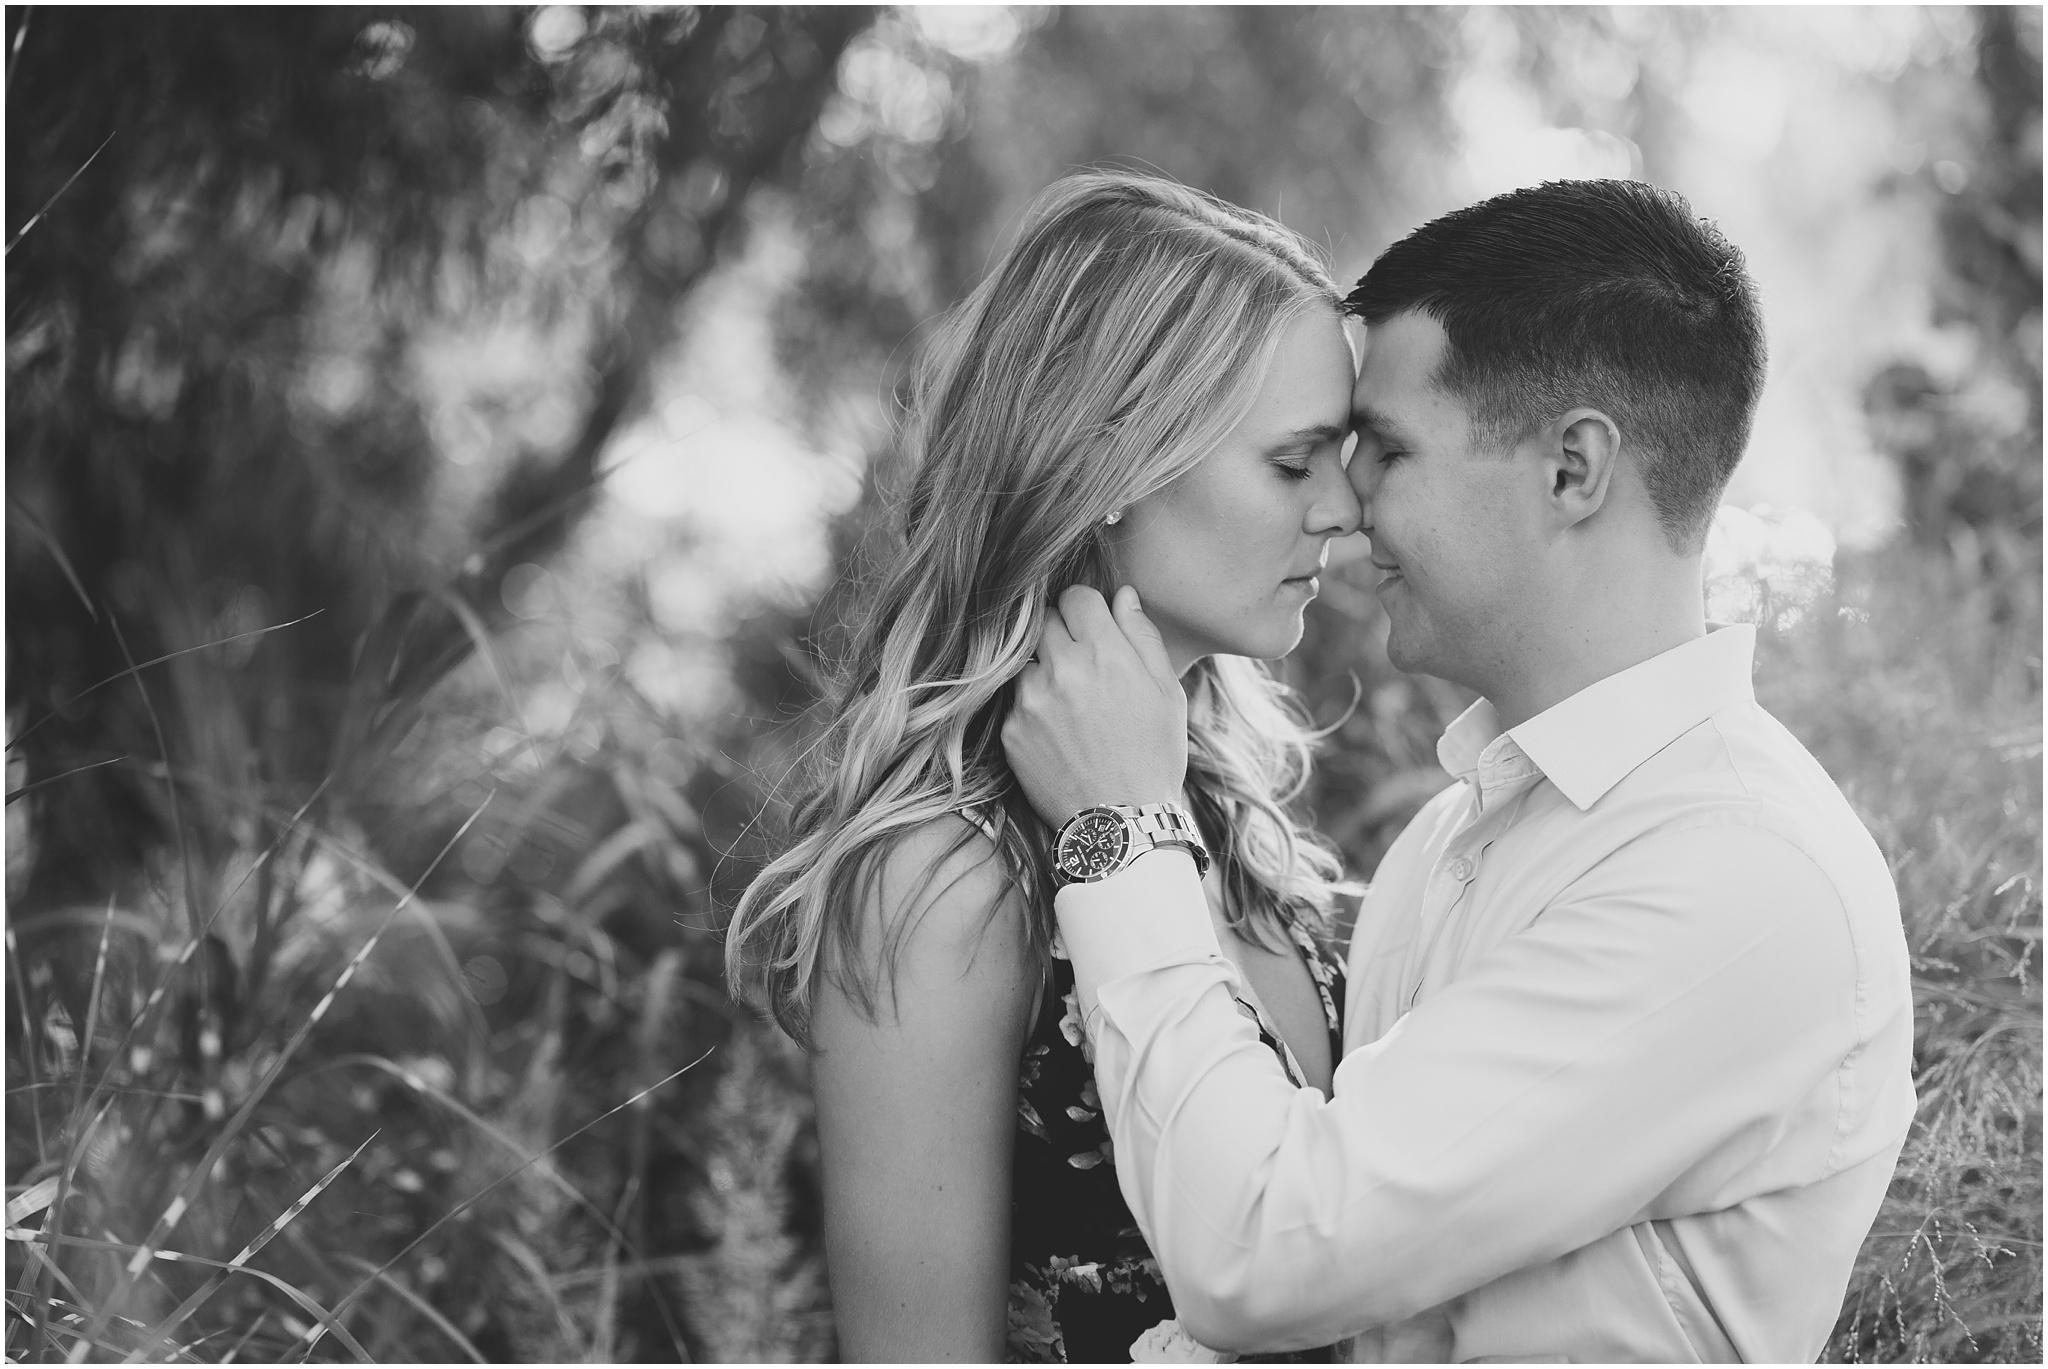 Matt + Tania | NJ Engagement Photography | Cinnamon Wolfe Photography